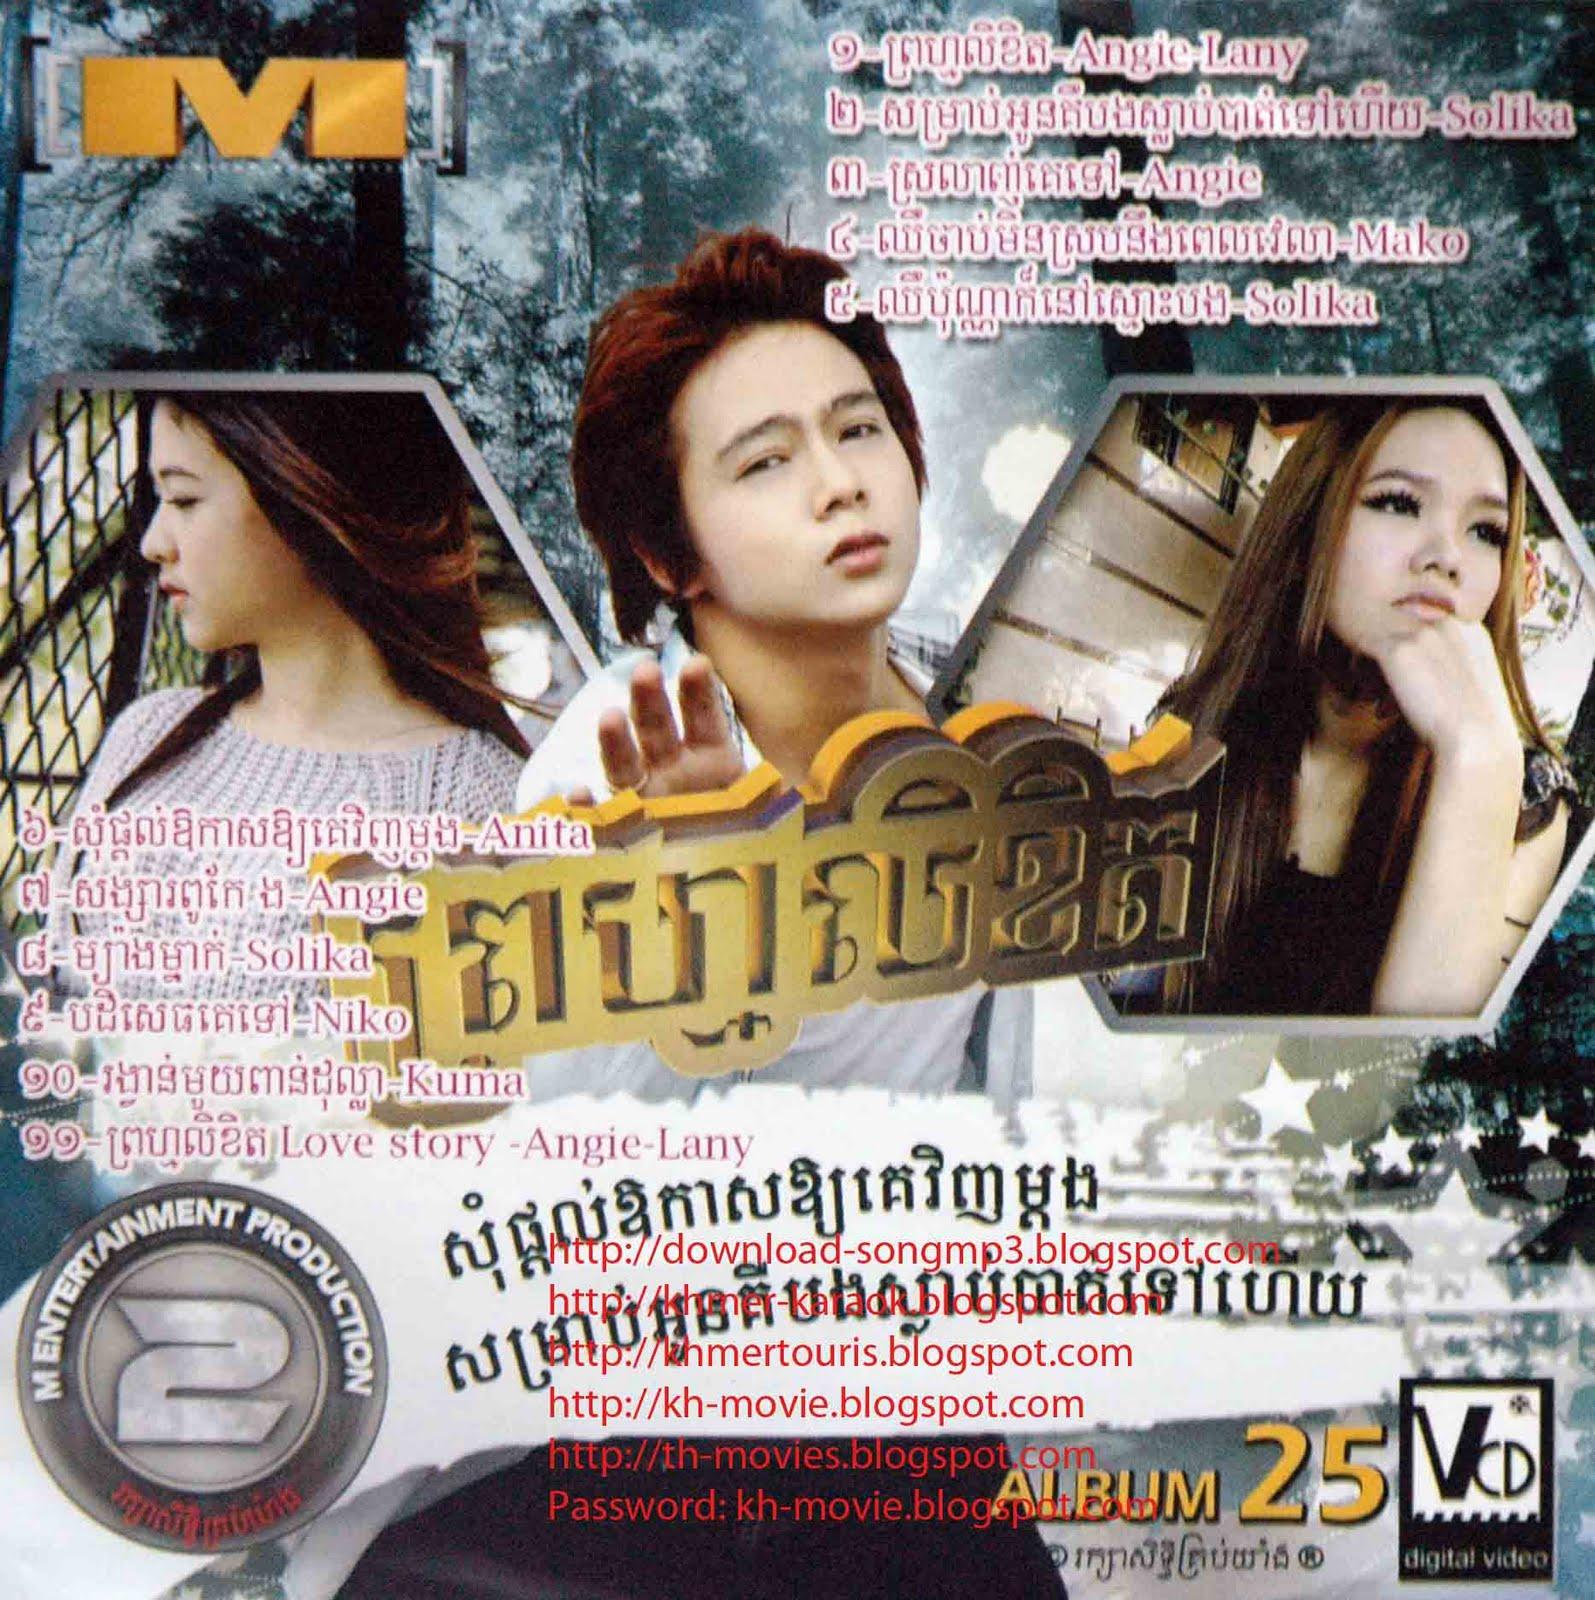 M VCD 25